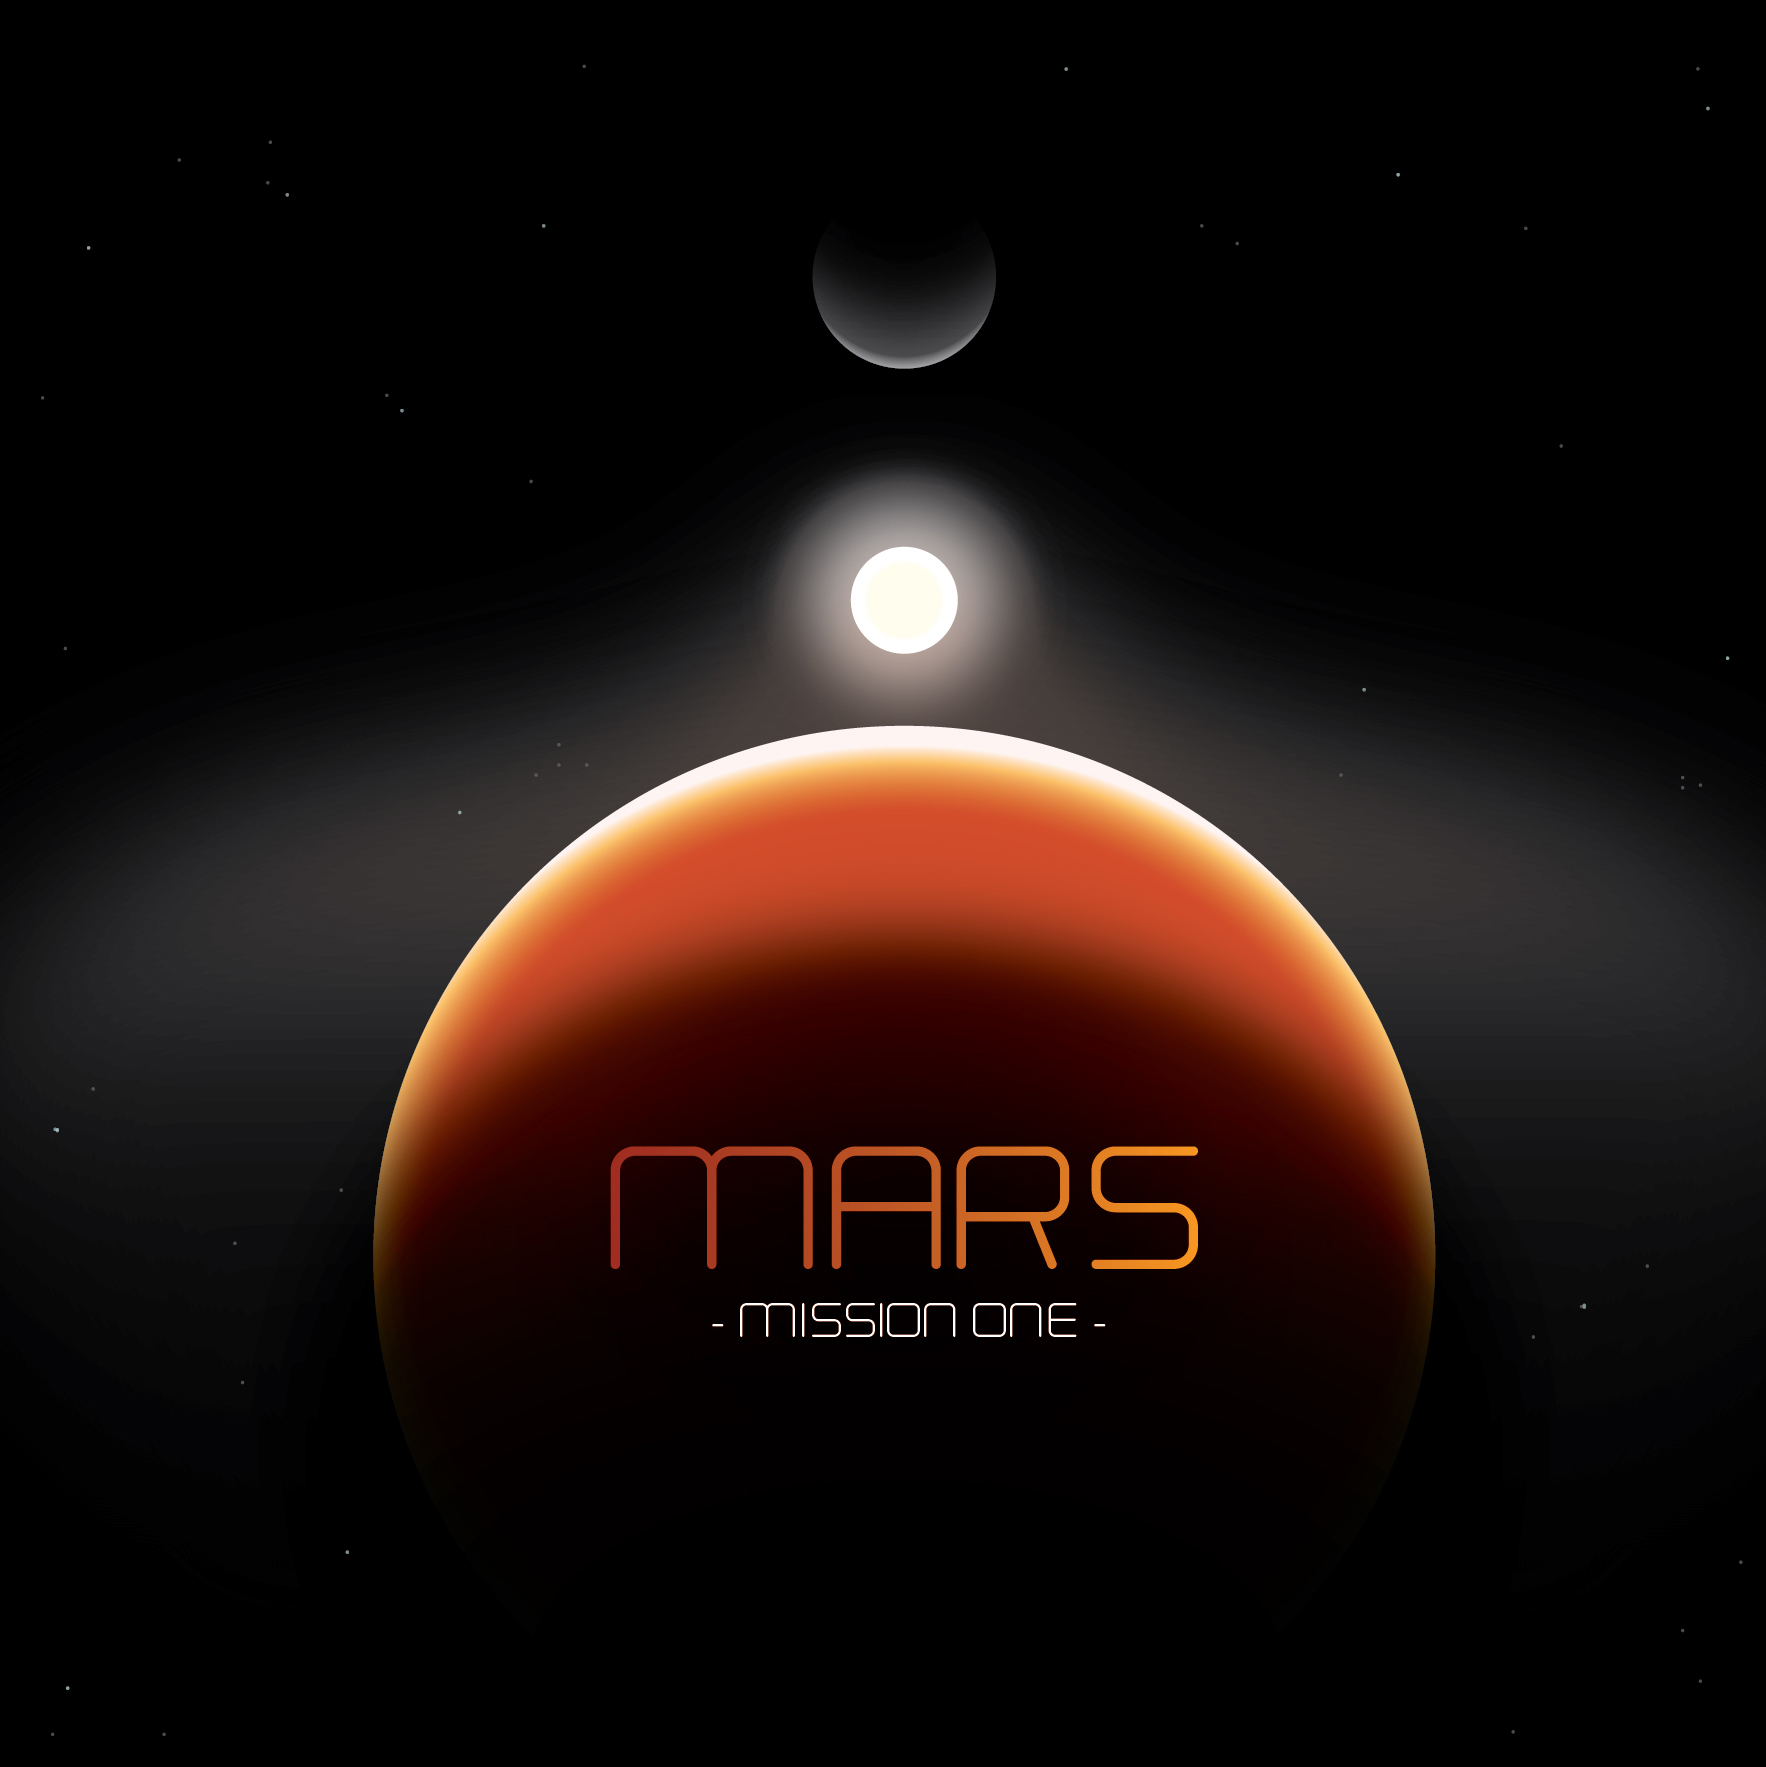 mars mission one